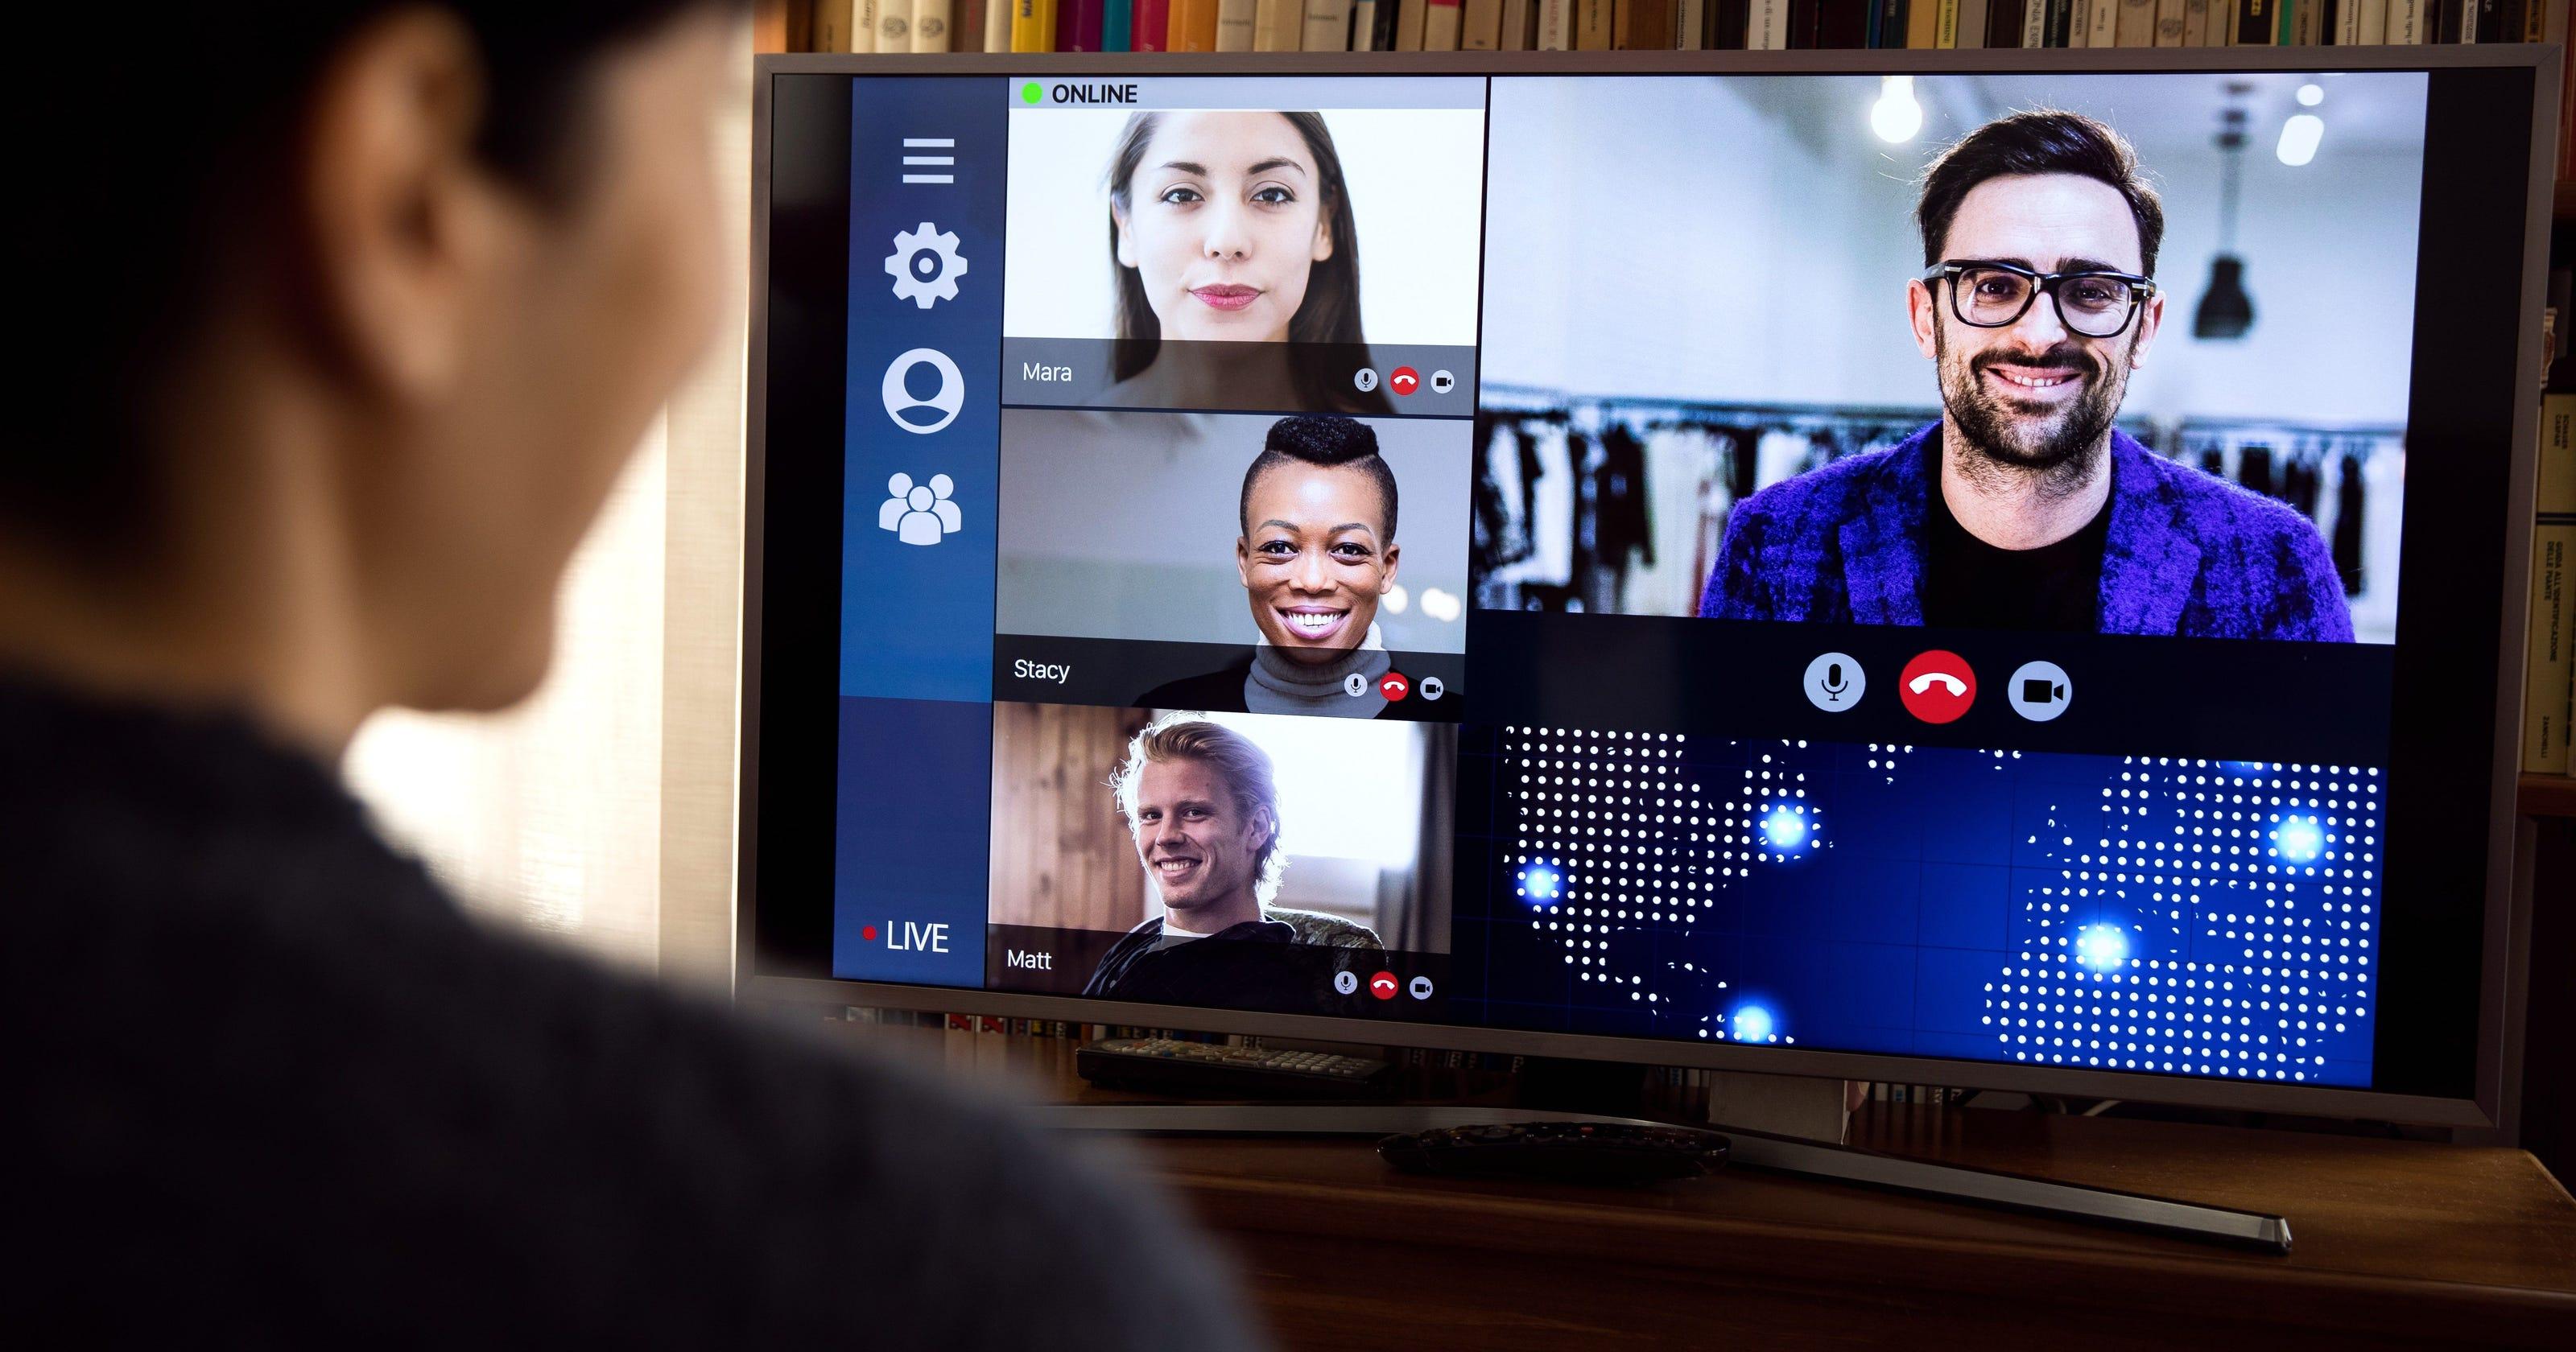 Amazon's Alexa soon will bring Zoom to your TV. We explain how